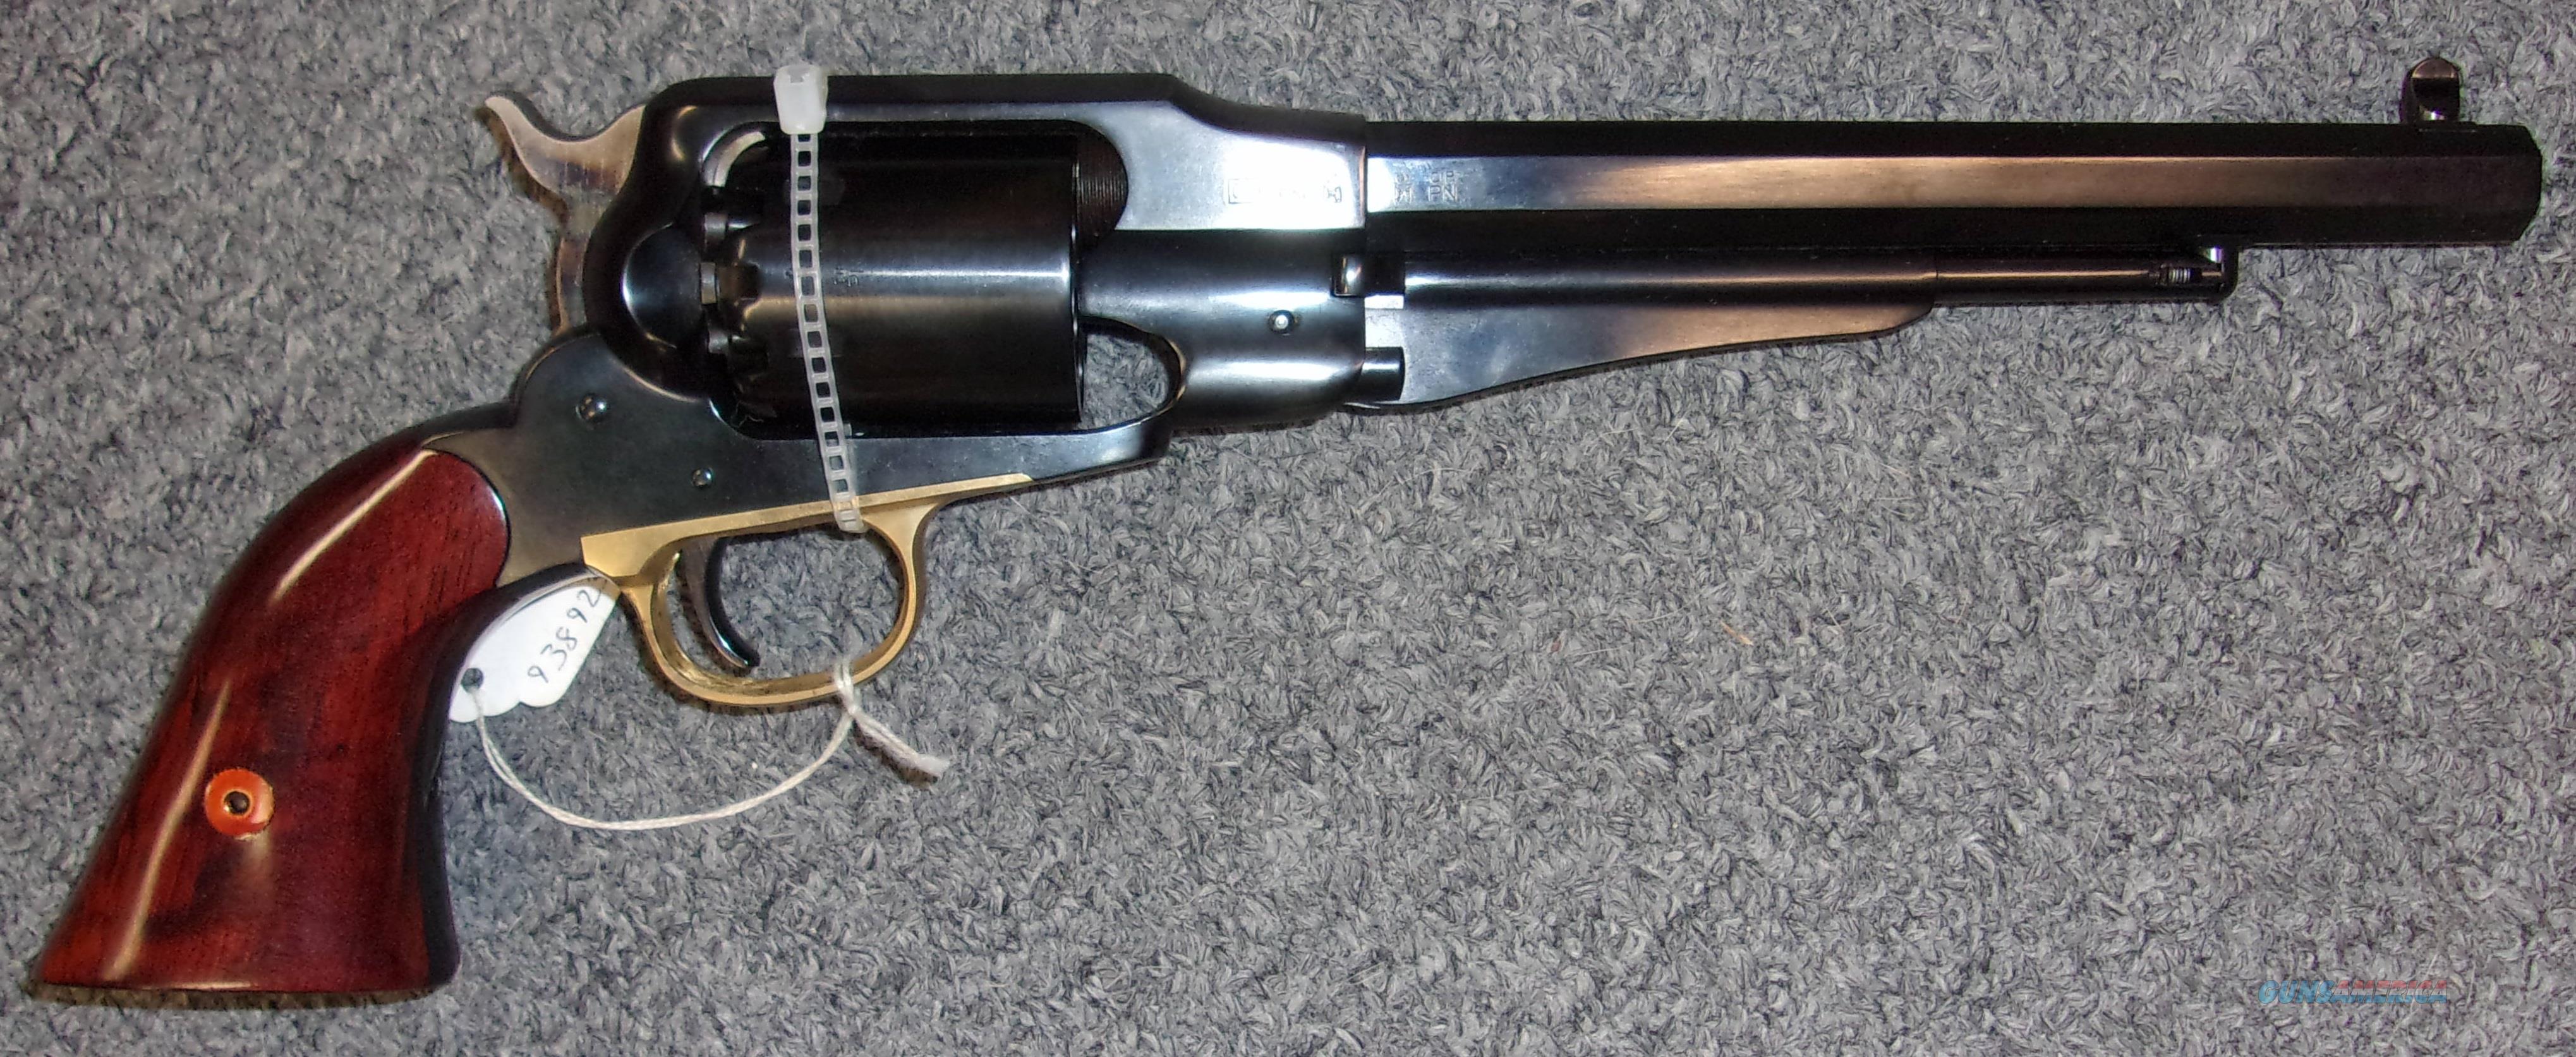 Uberti 1858 New Army (341000)  Non-Guns > Black Powder Cartridge